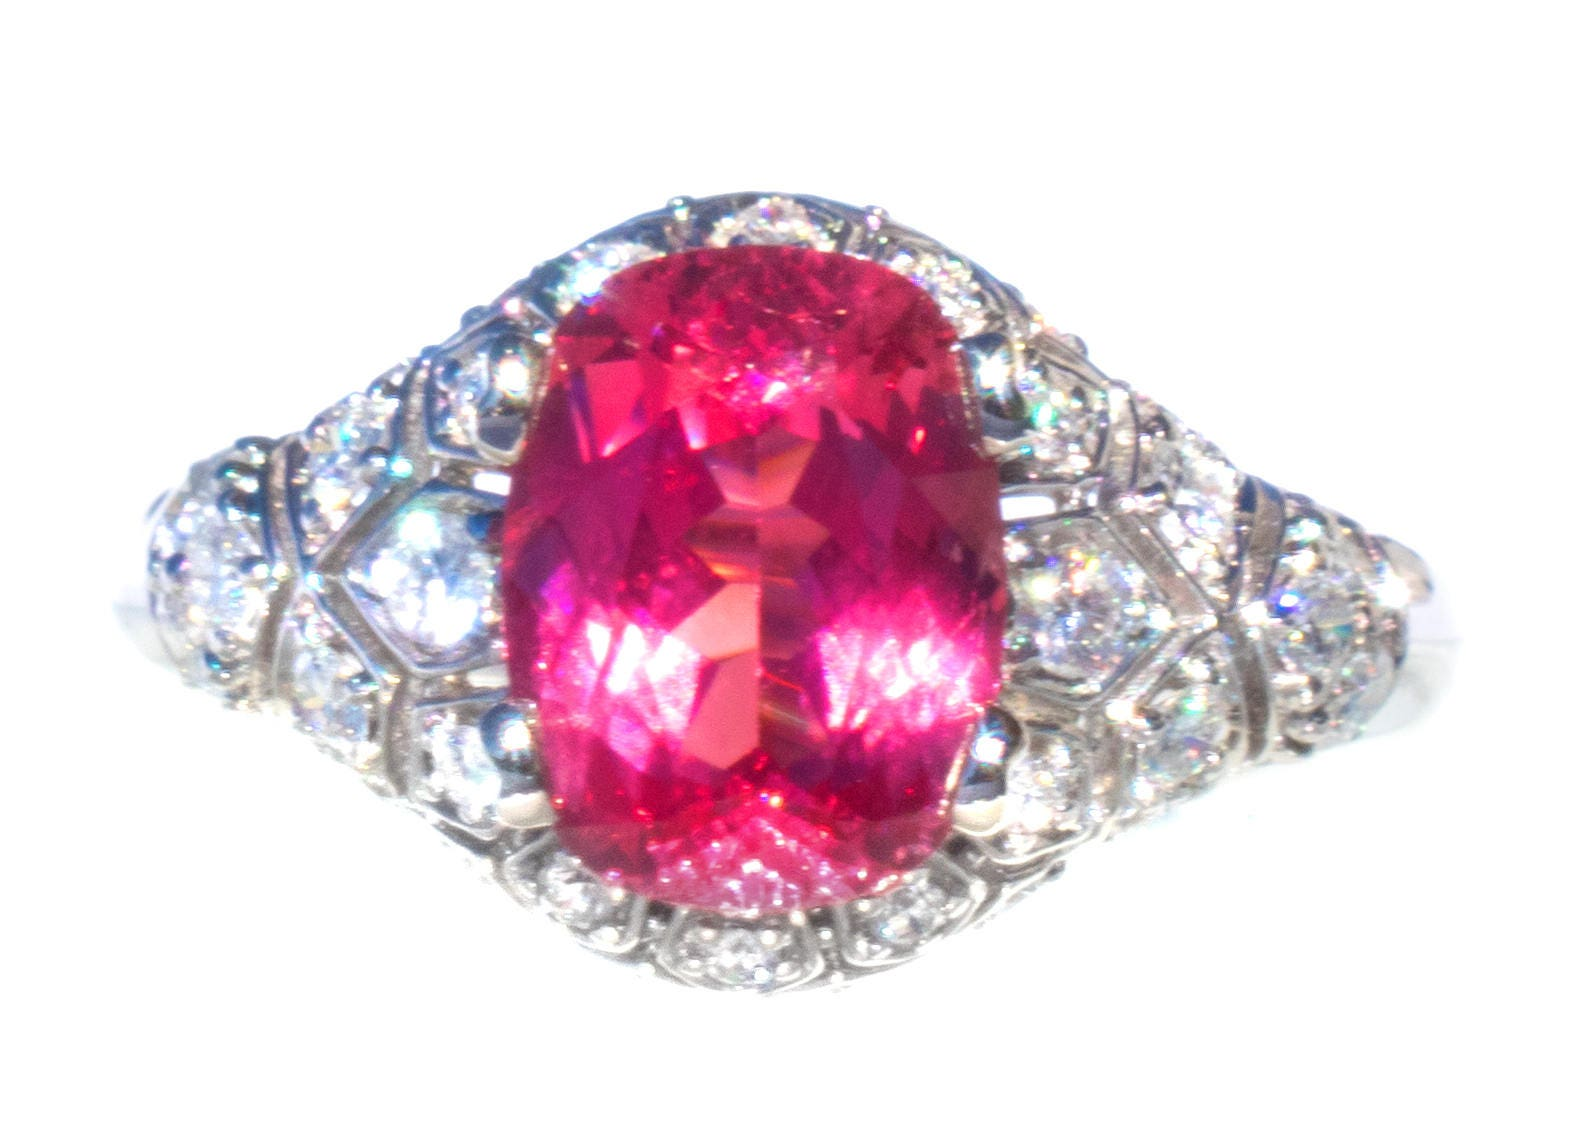 VERY RARE 2.47 ct Natural Mahenge Spinel & Diamond 18K Ring